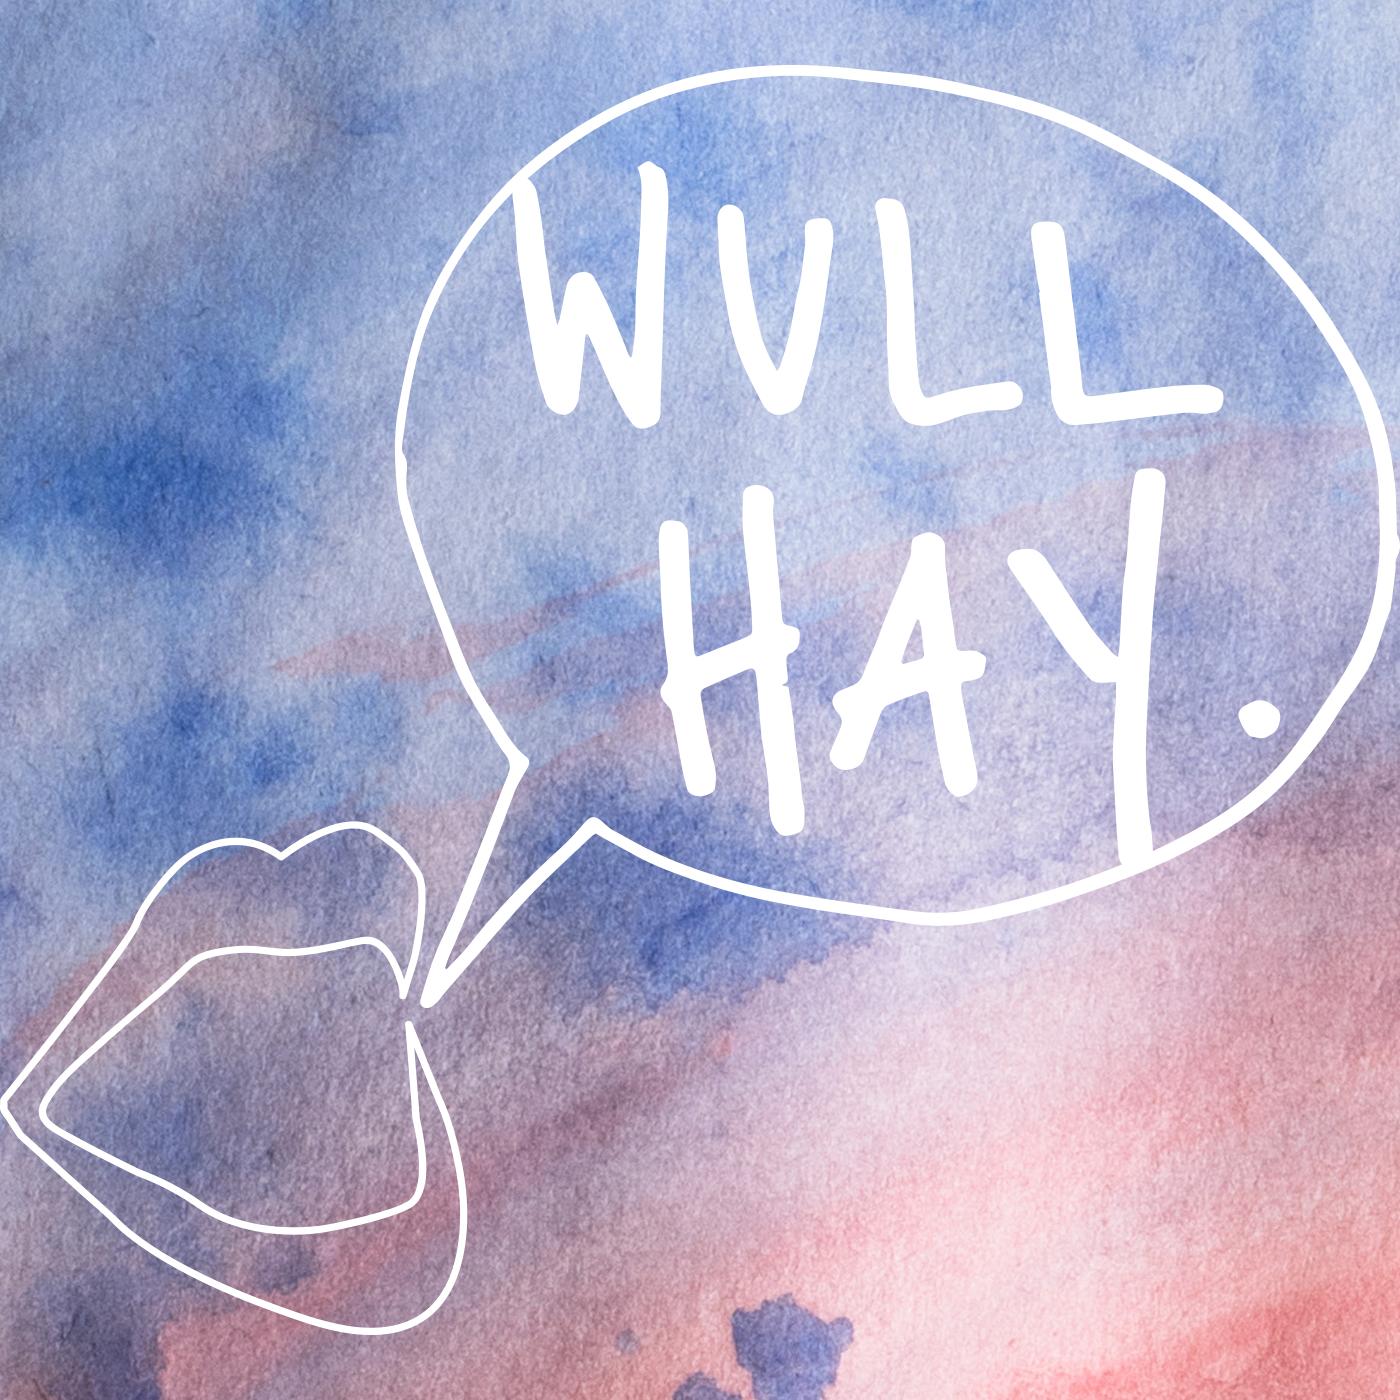 wull hay. show art